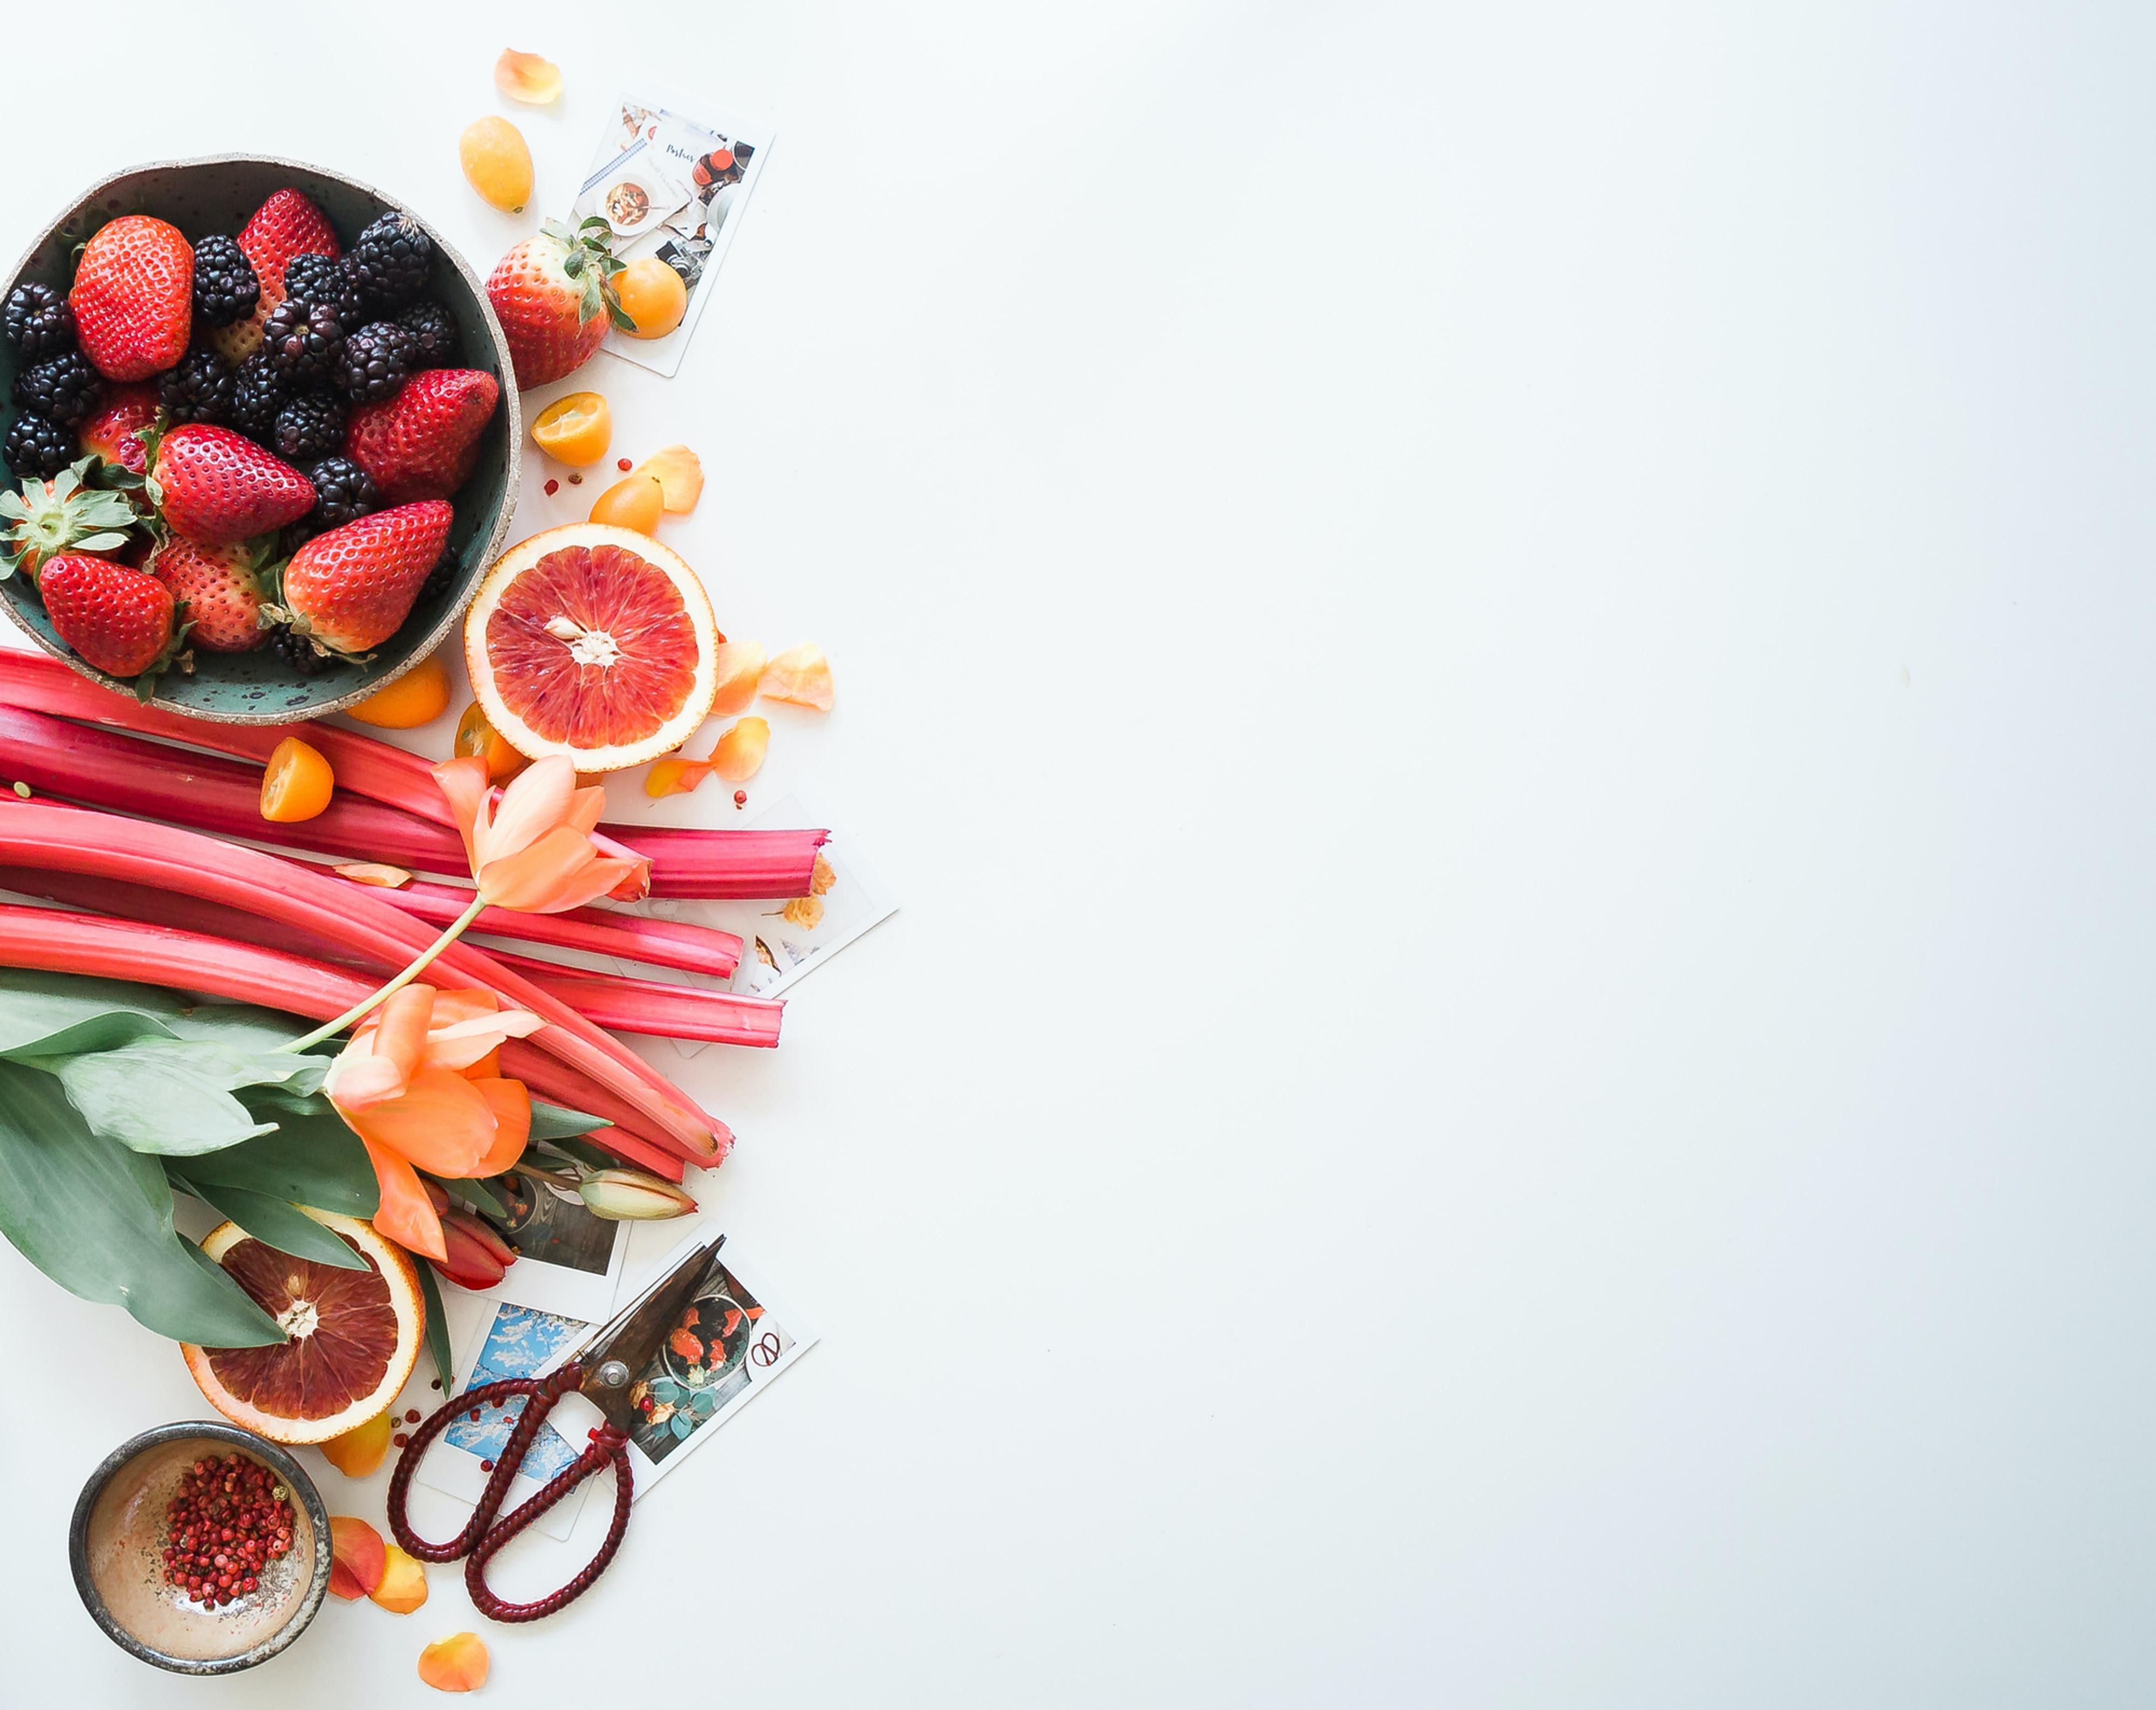 90 Minute Nutrition Consultation